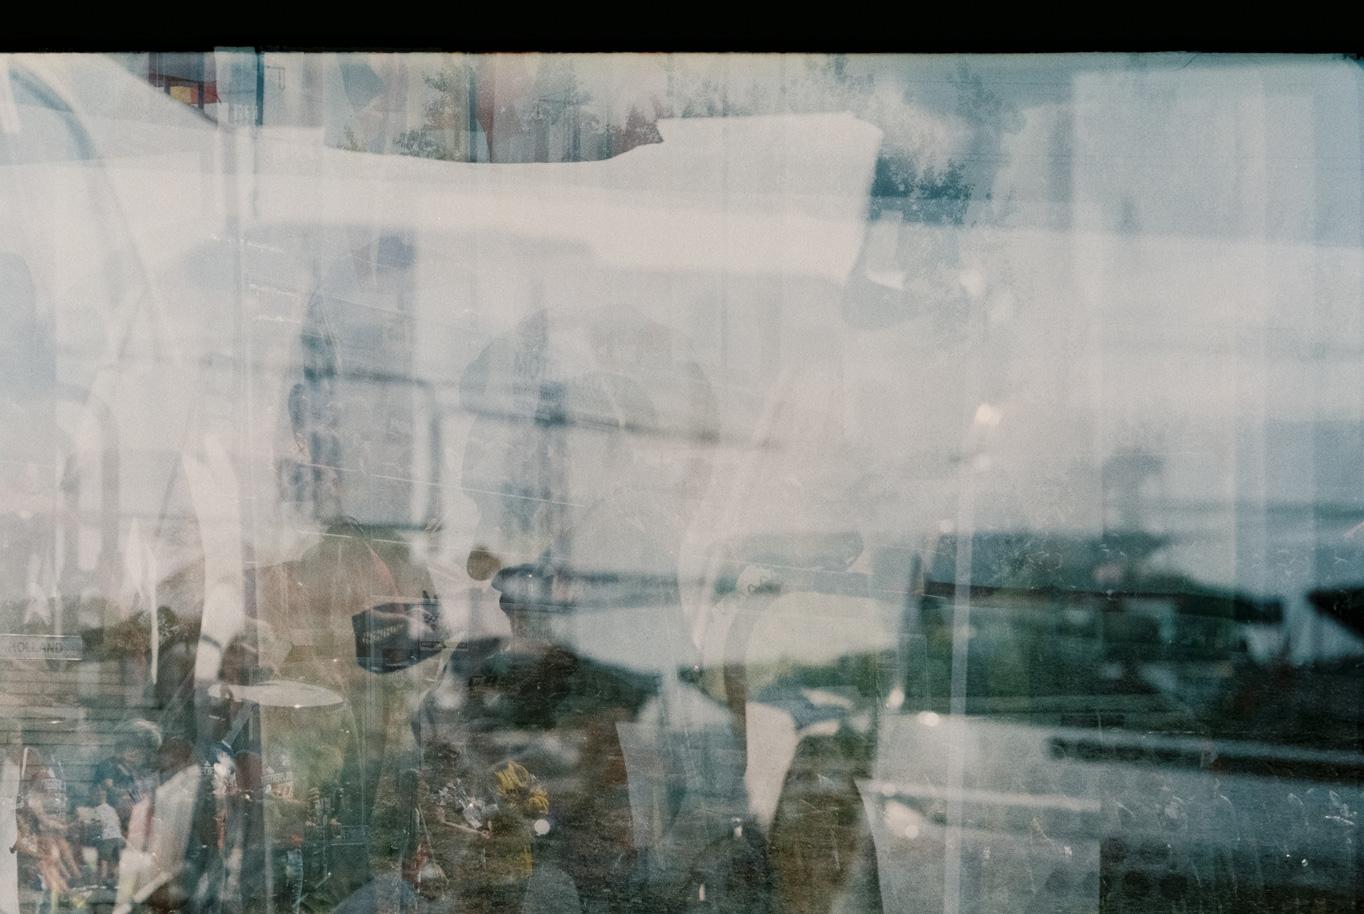 Fotowettbewerb Abstrakt Platz 4 Frank Wouters